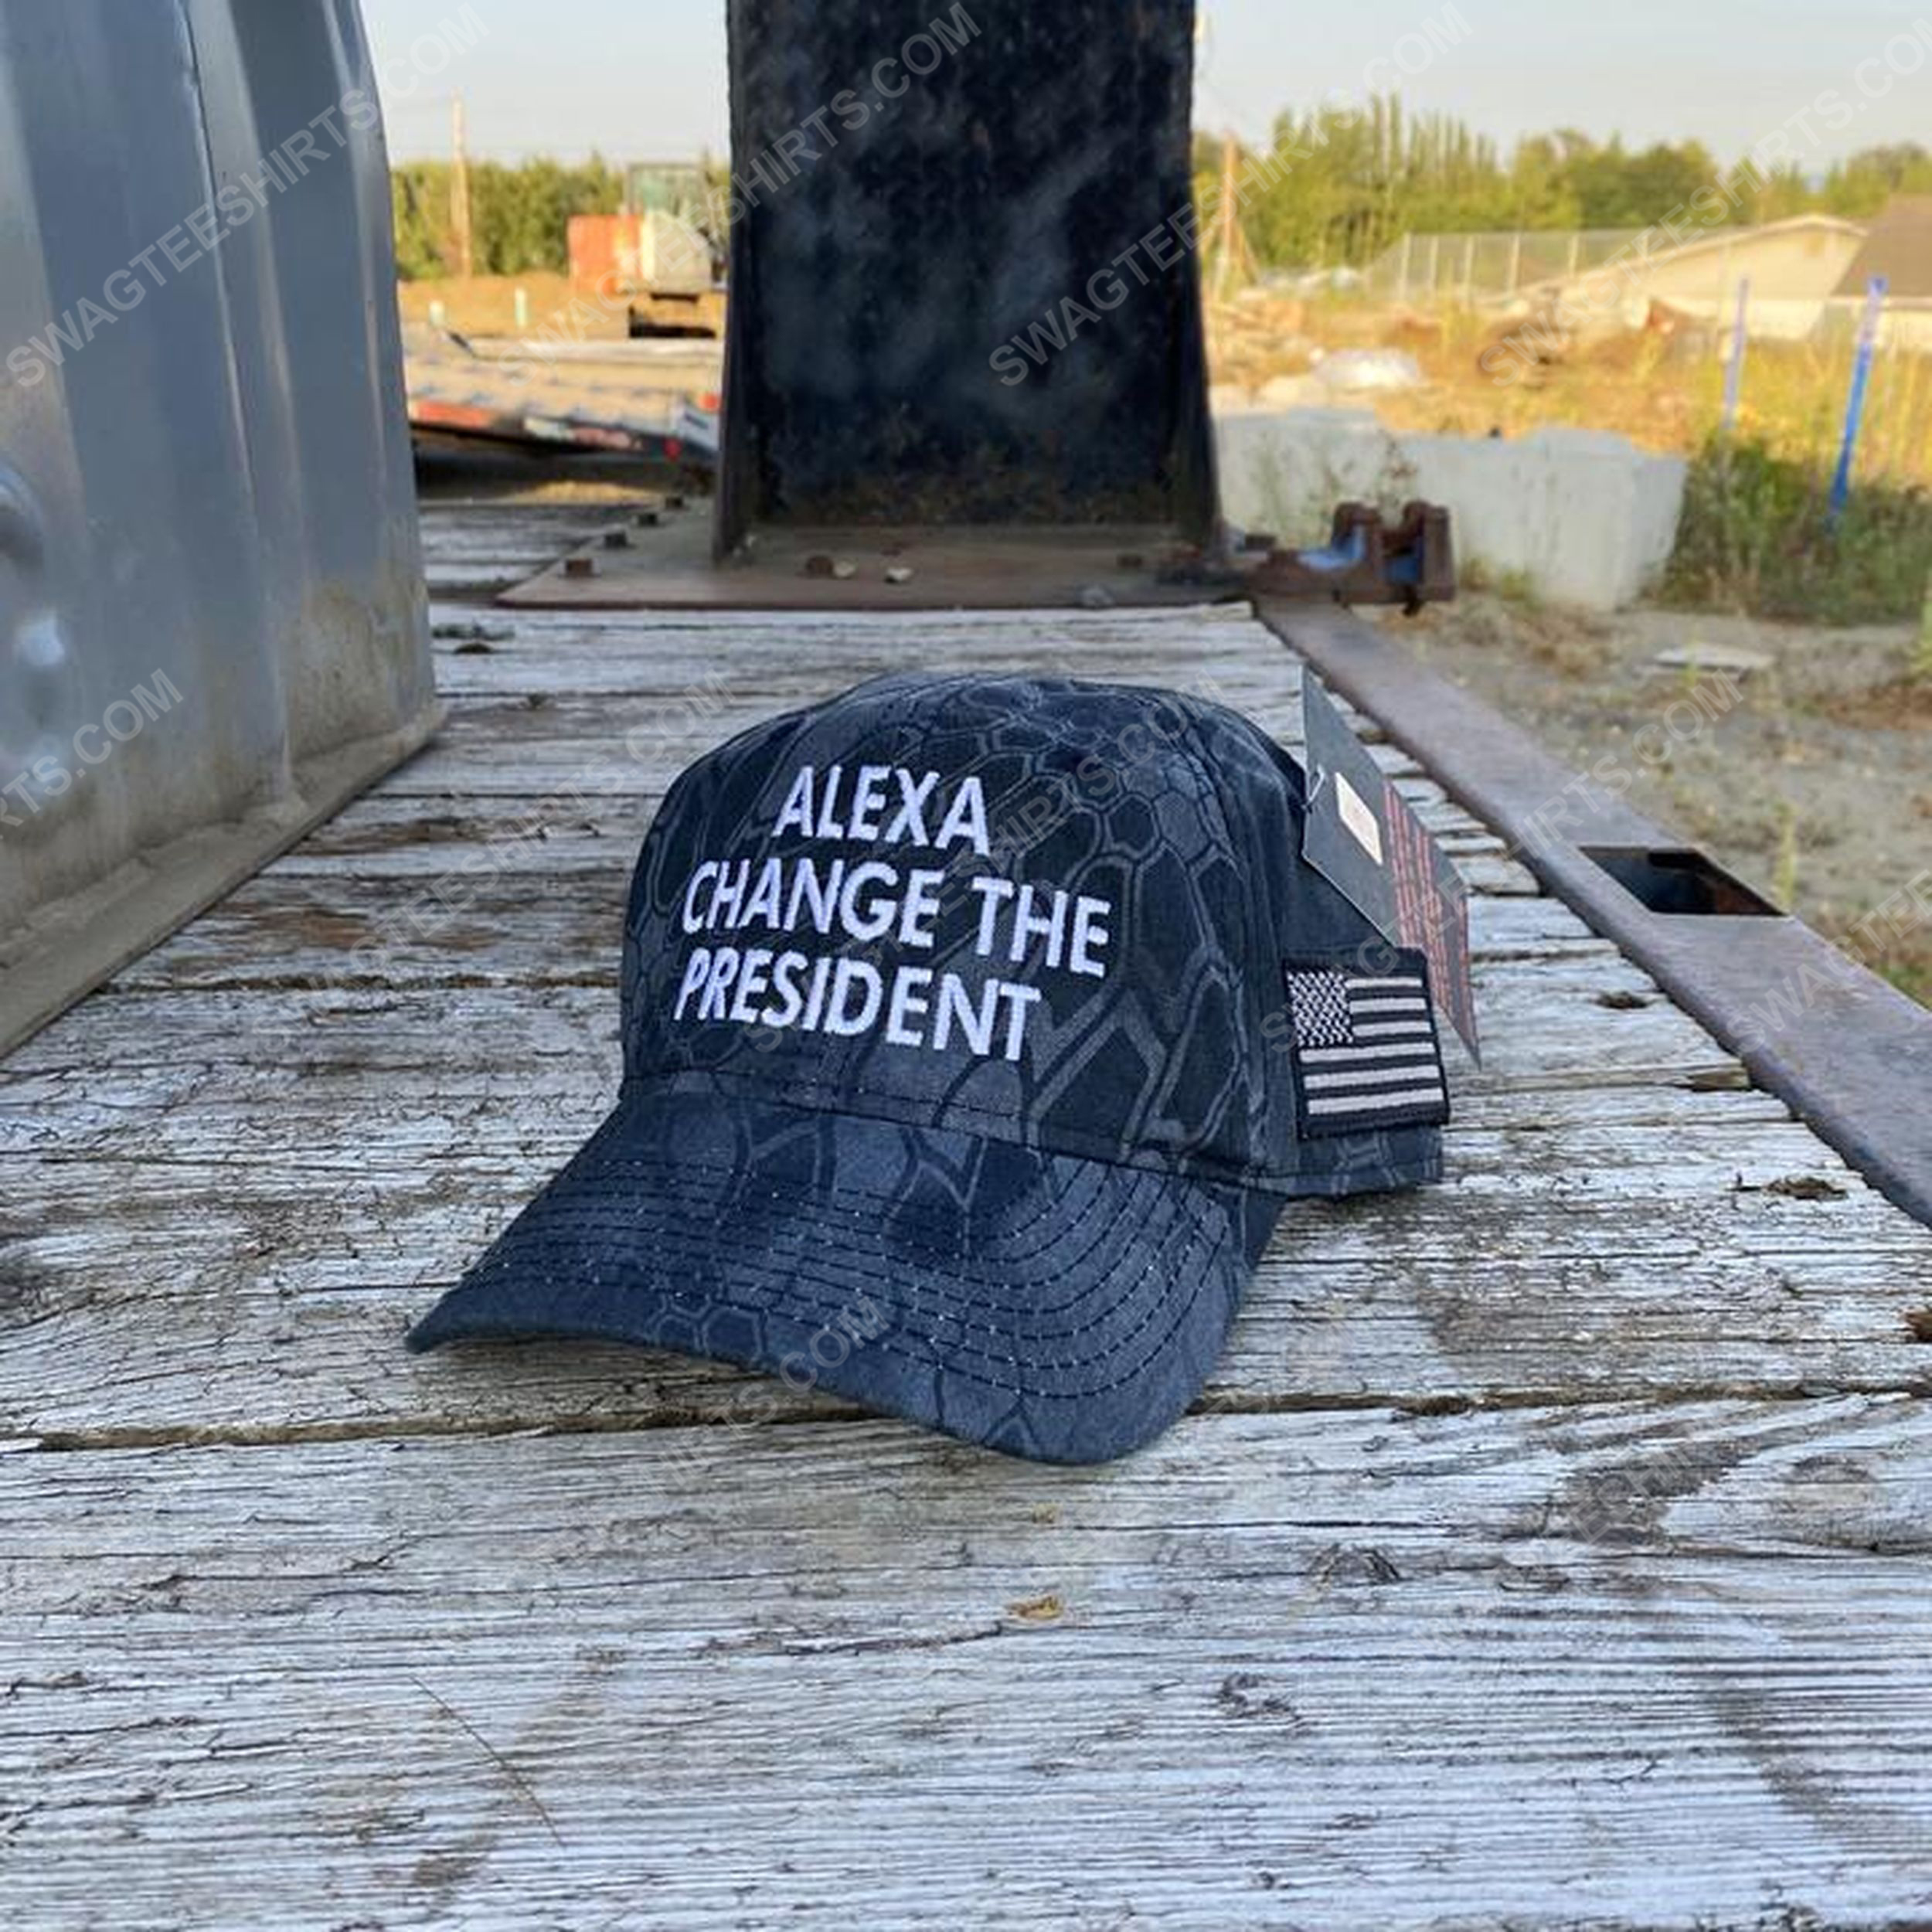 Alexa change the president full print classic hat 1